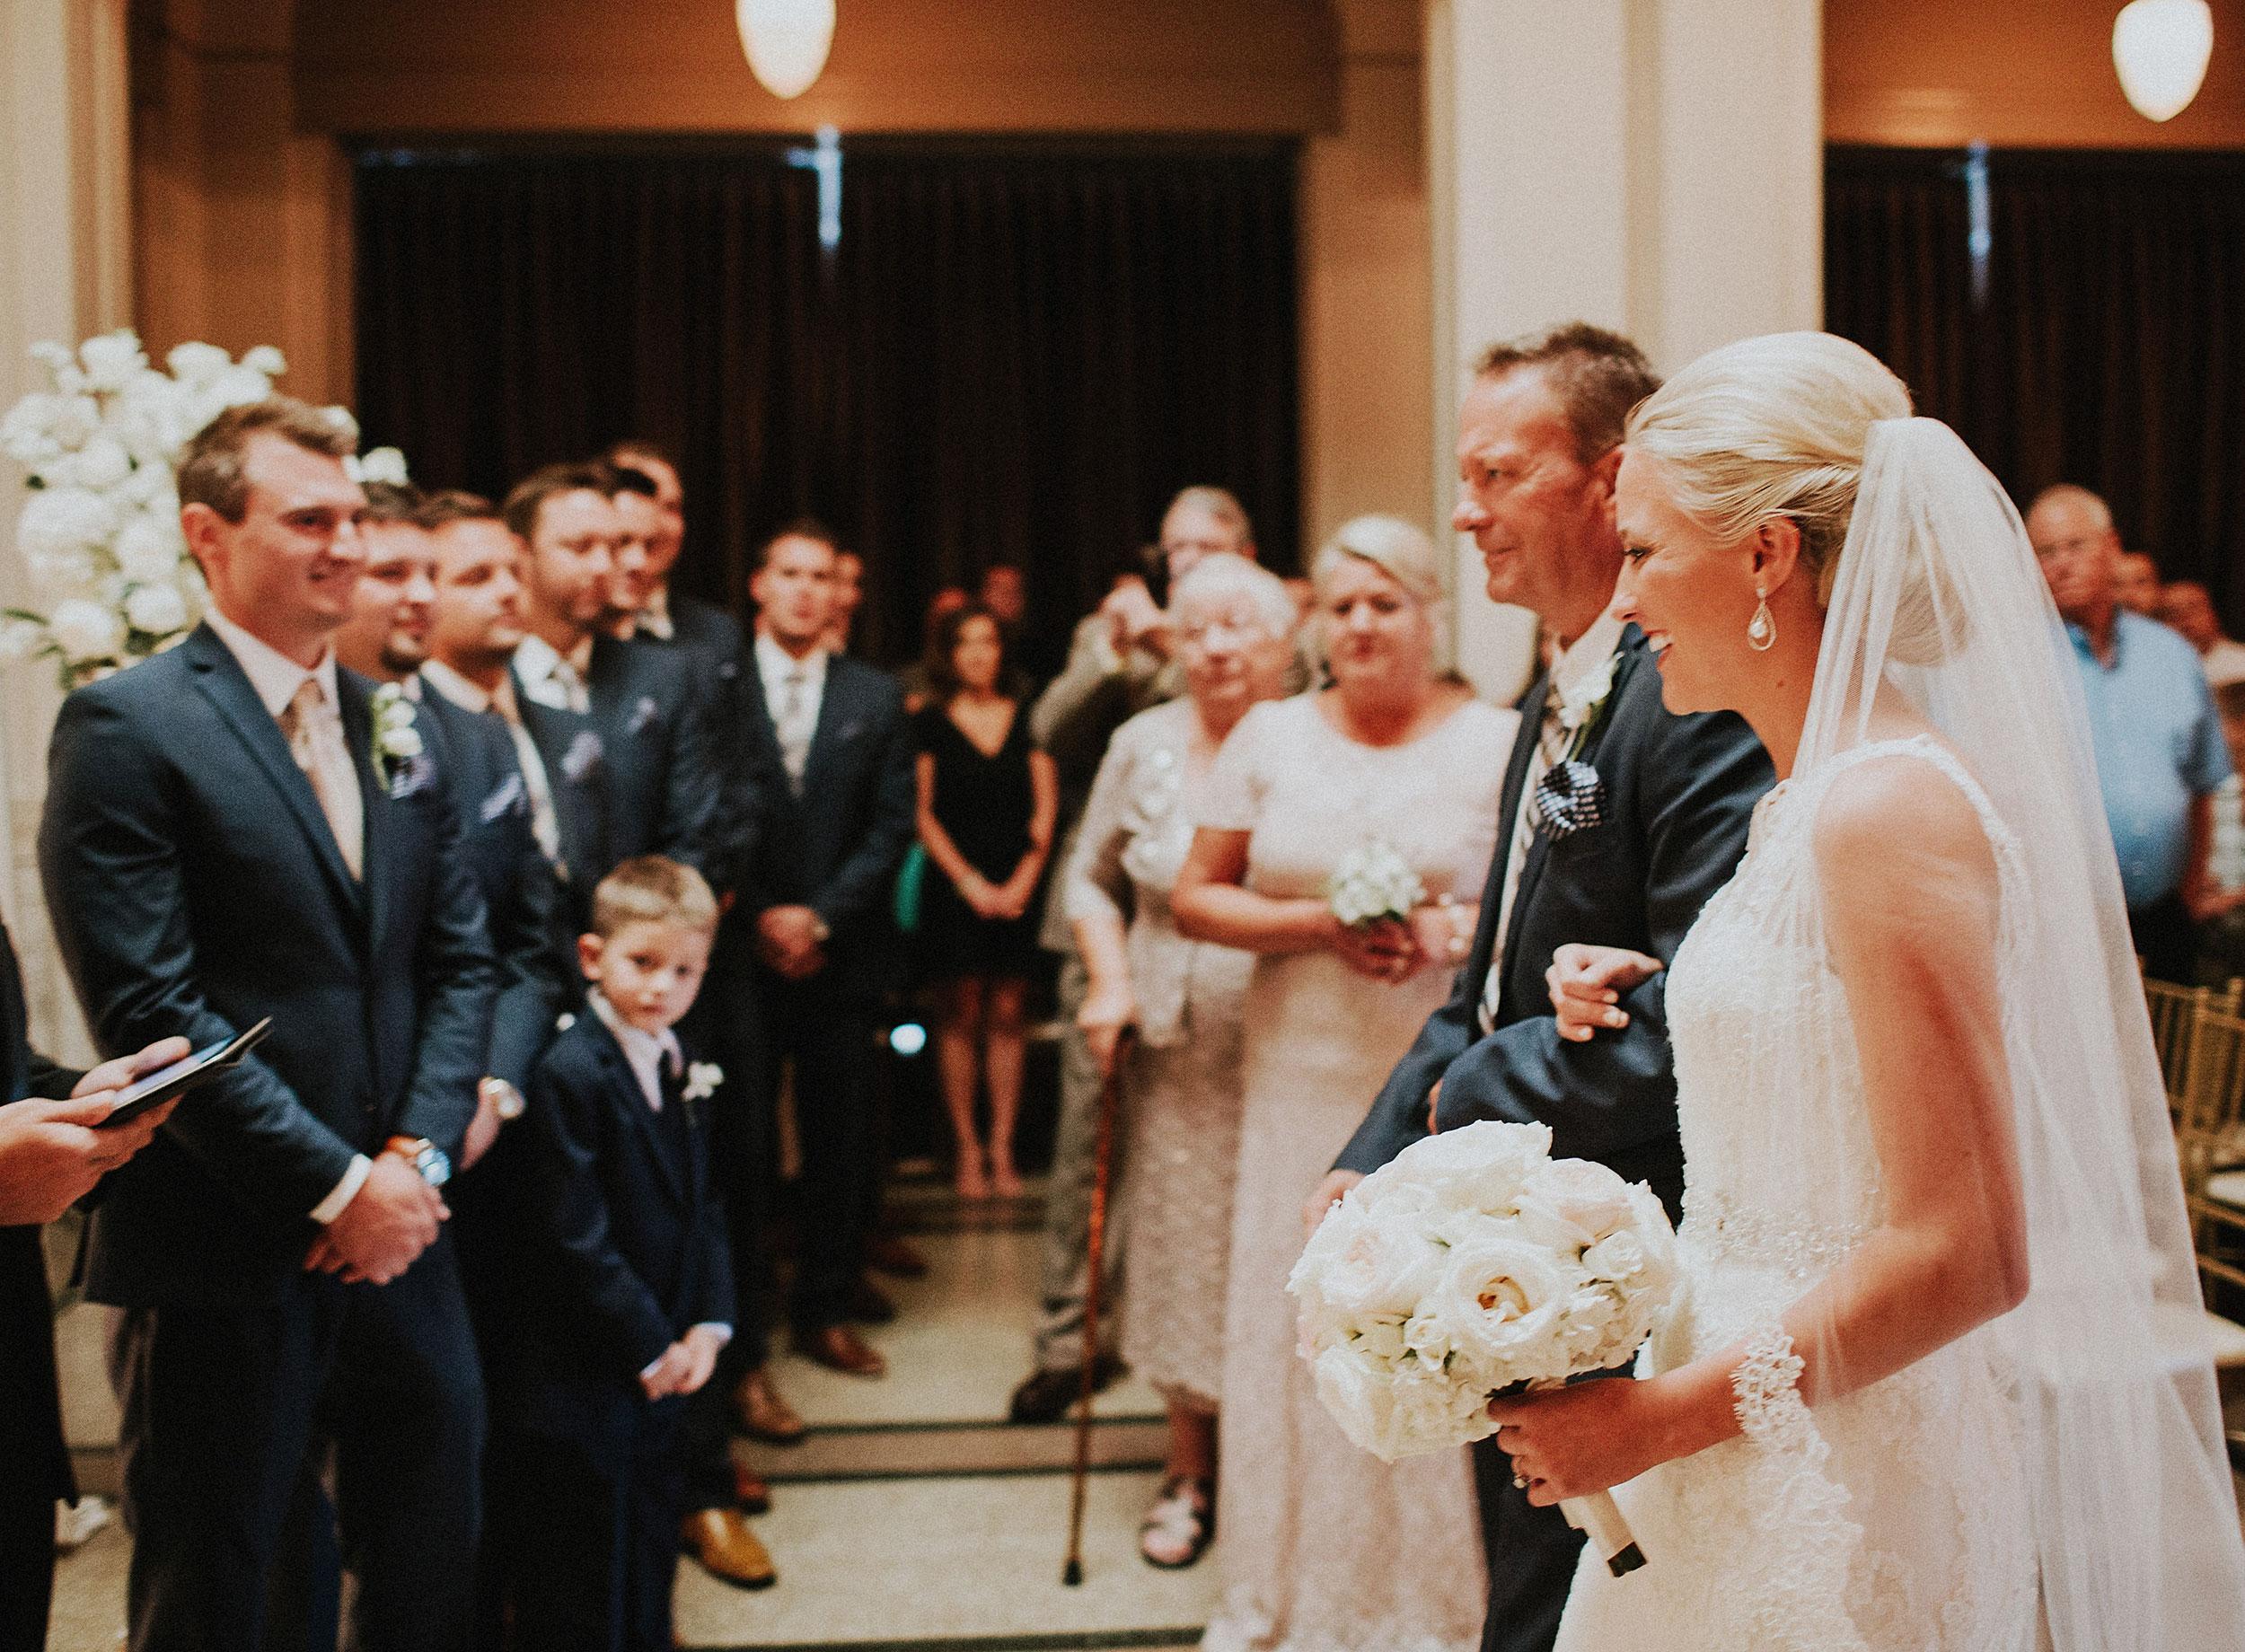 olmsted-wedding-louisville-kentucky-023.JPG